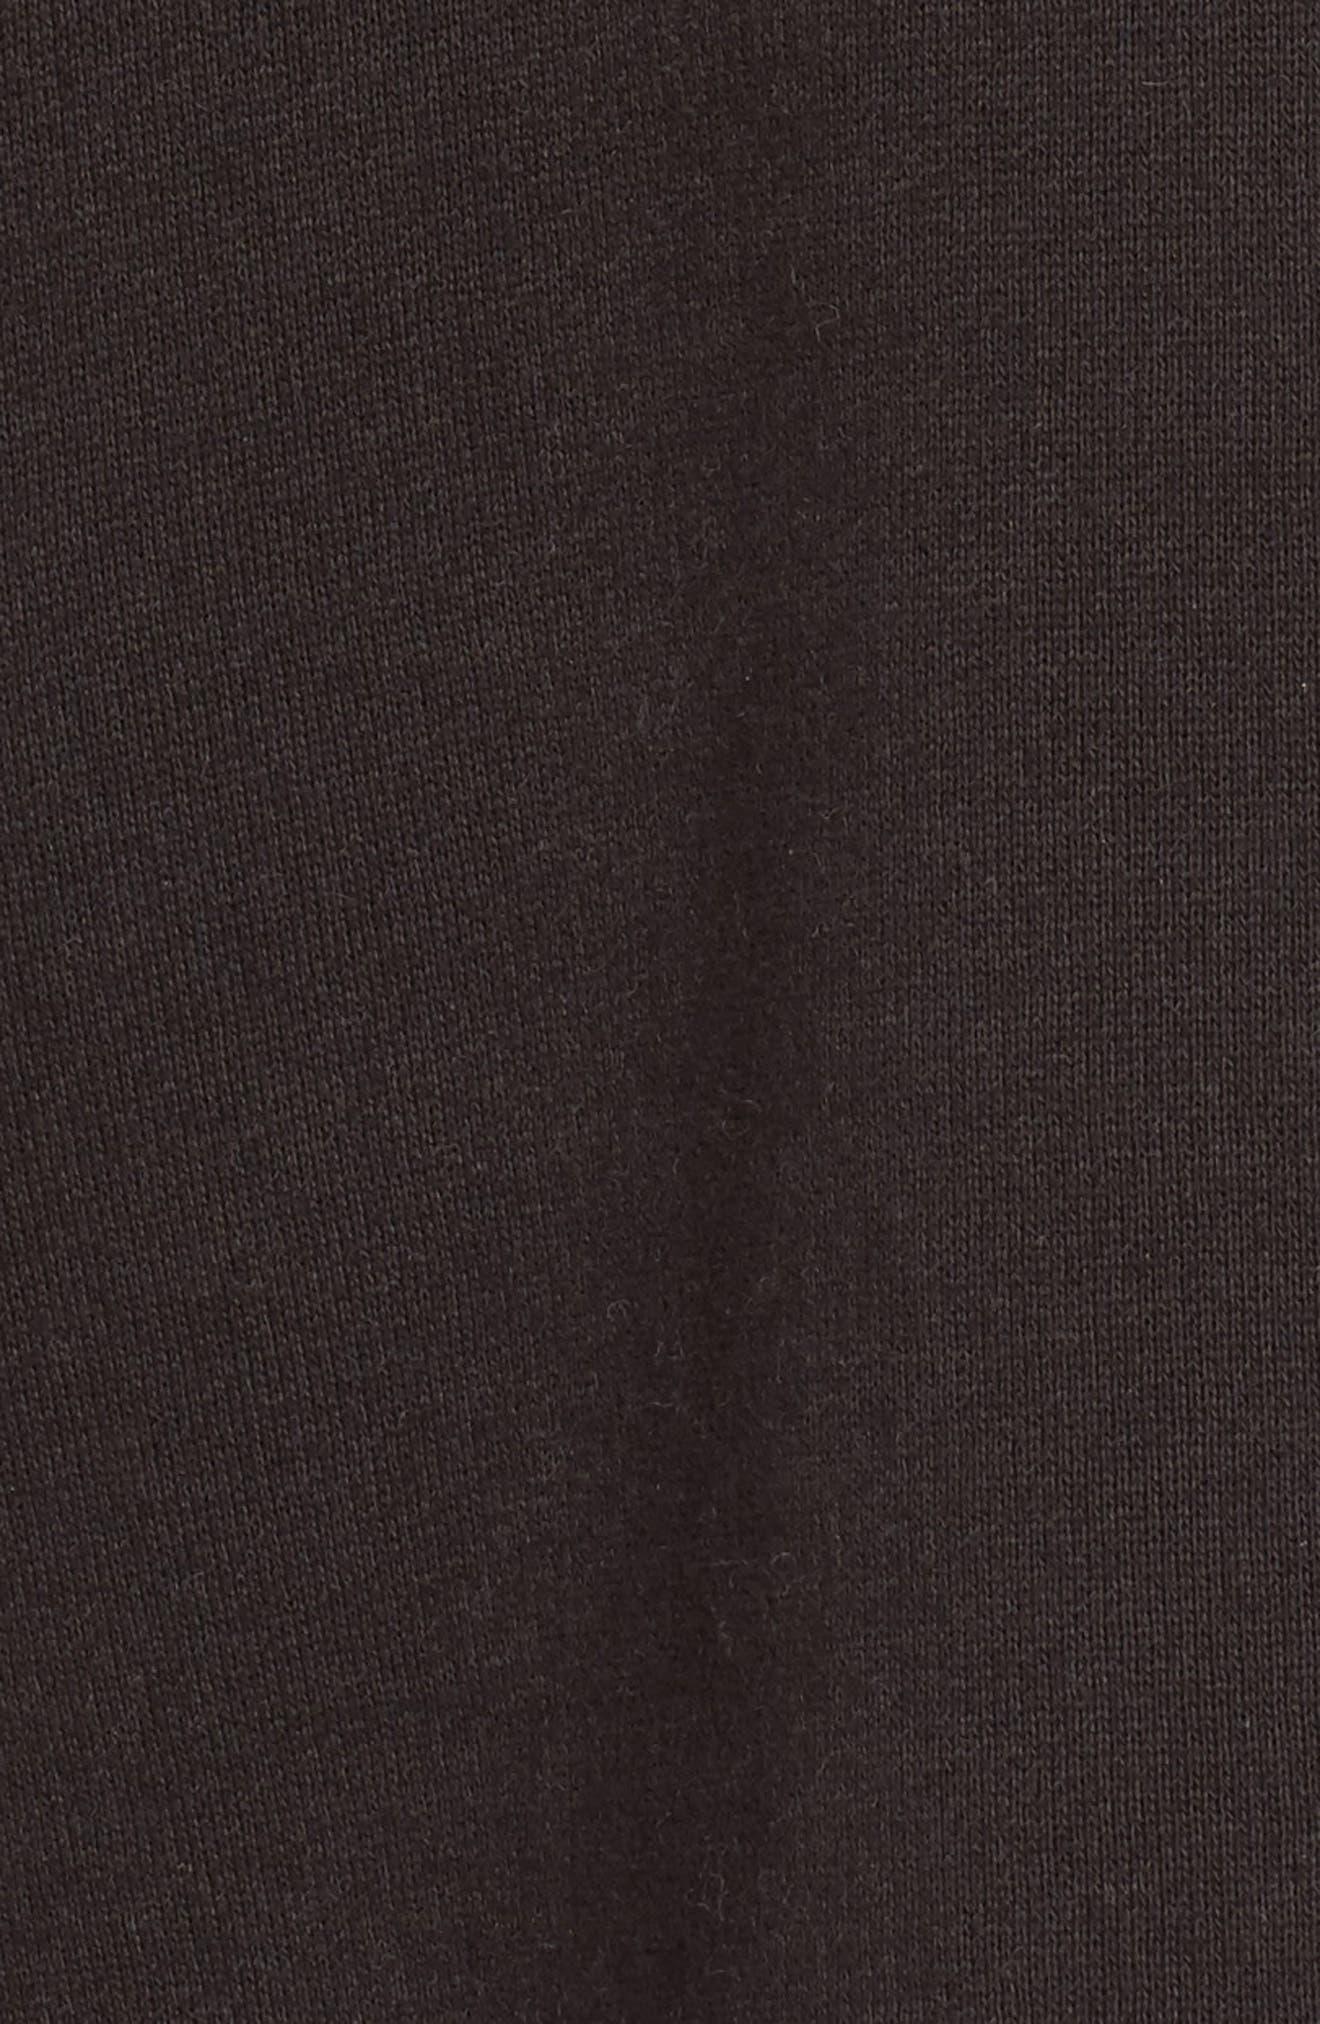 Fleece Lined Hoodie,                             Alternate thumbnail 5, color,                             Carbon